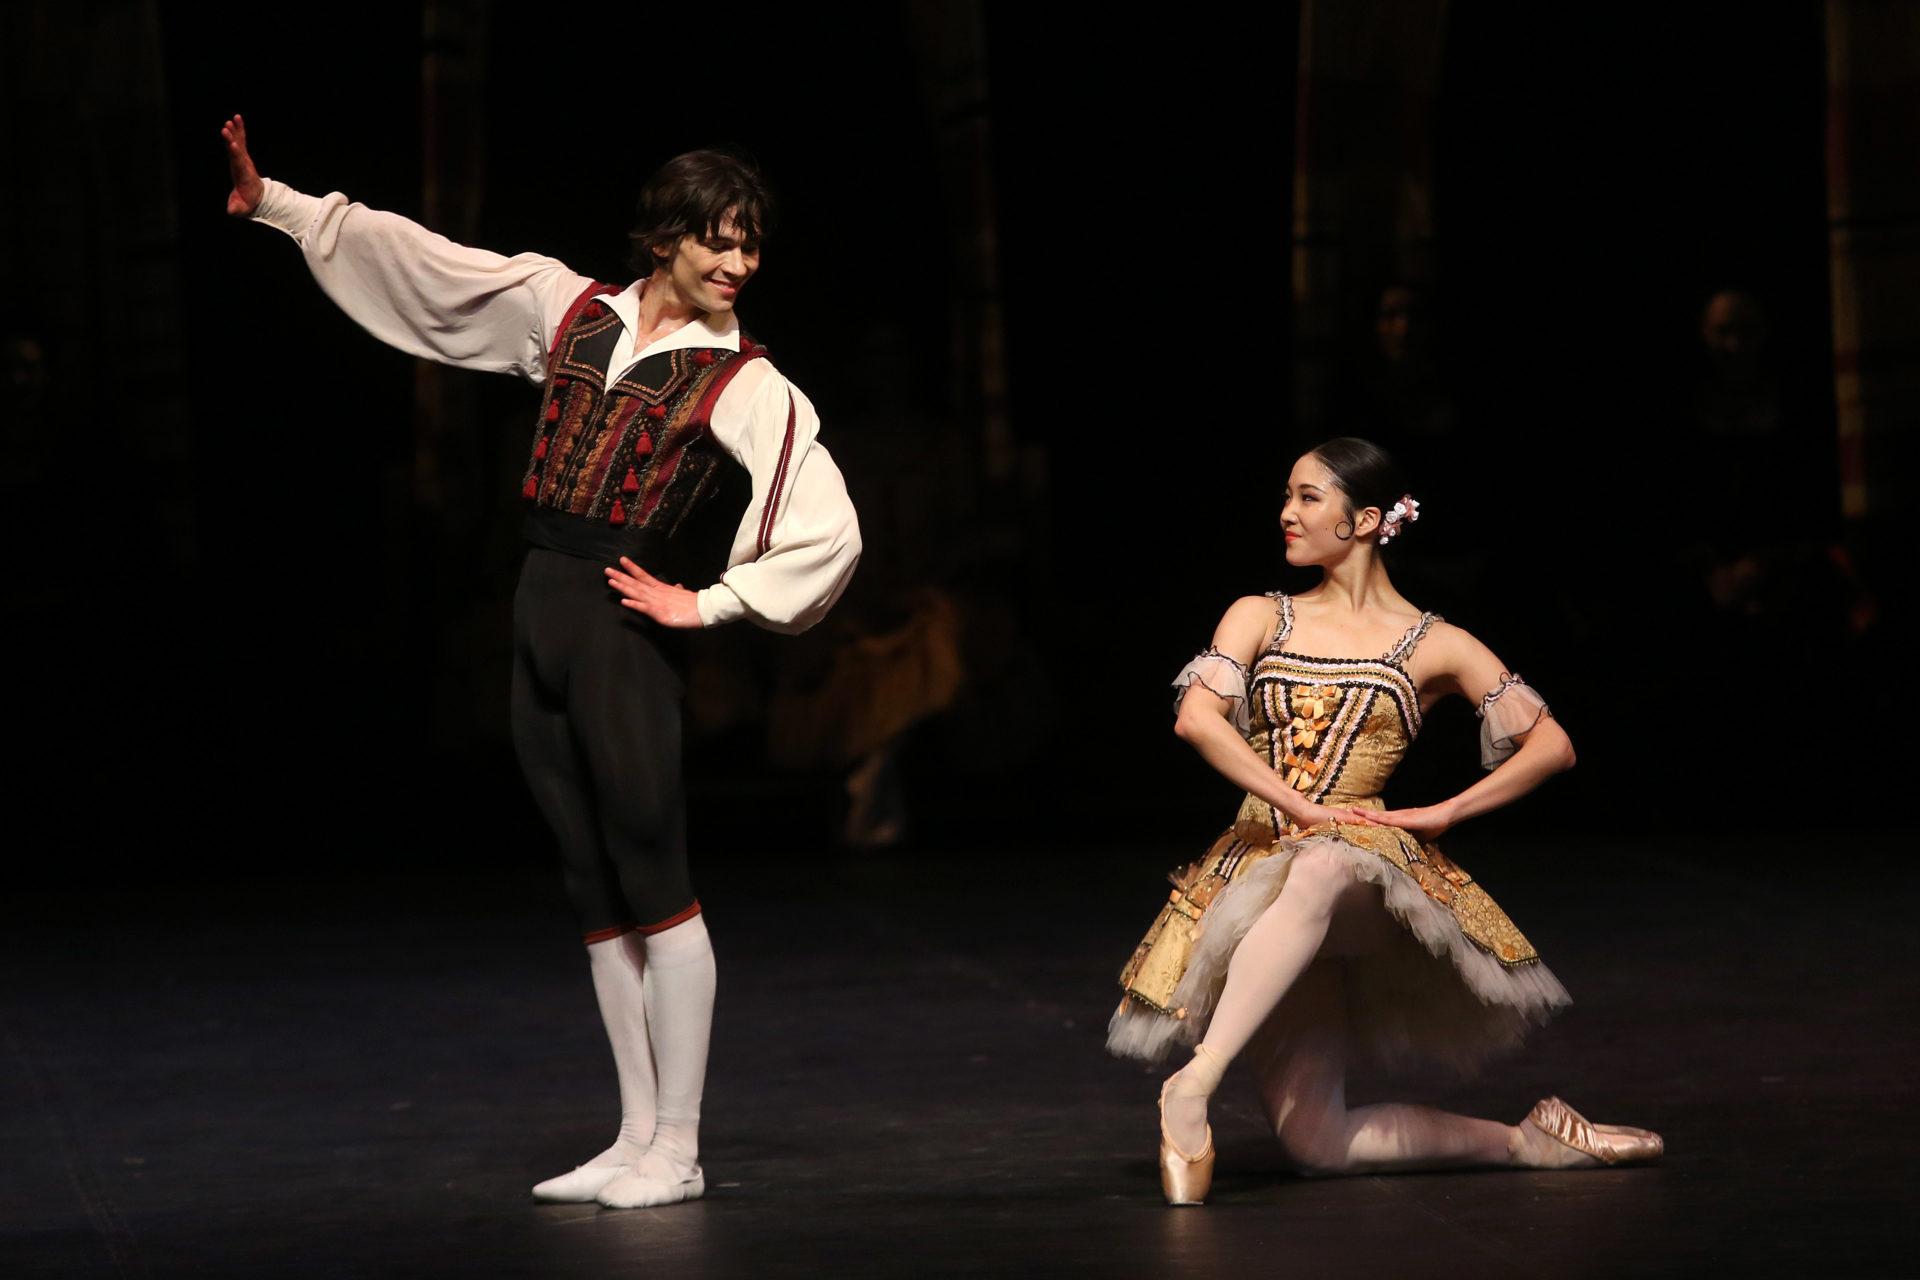 Don_Quixote_HH_Ballett_Foto_AnjaBeutler.de_681